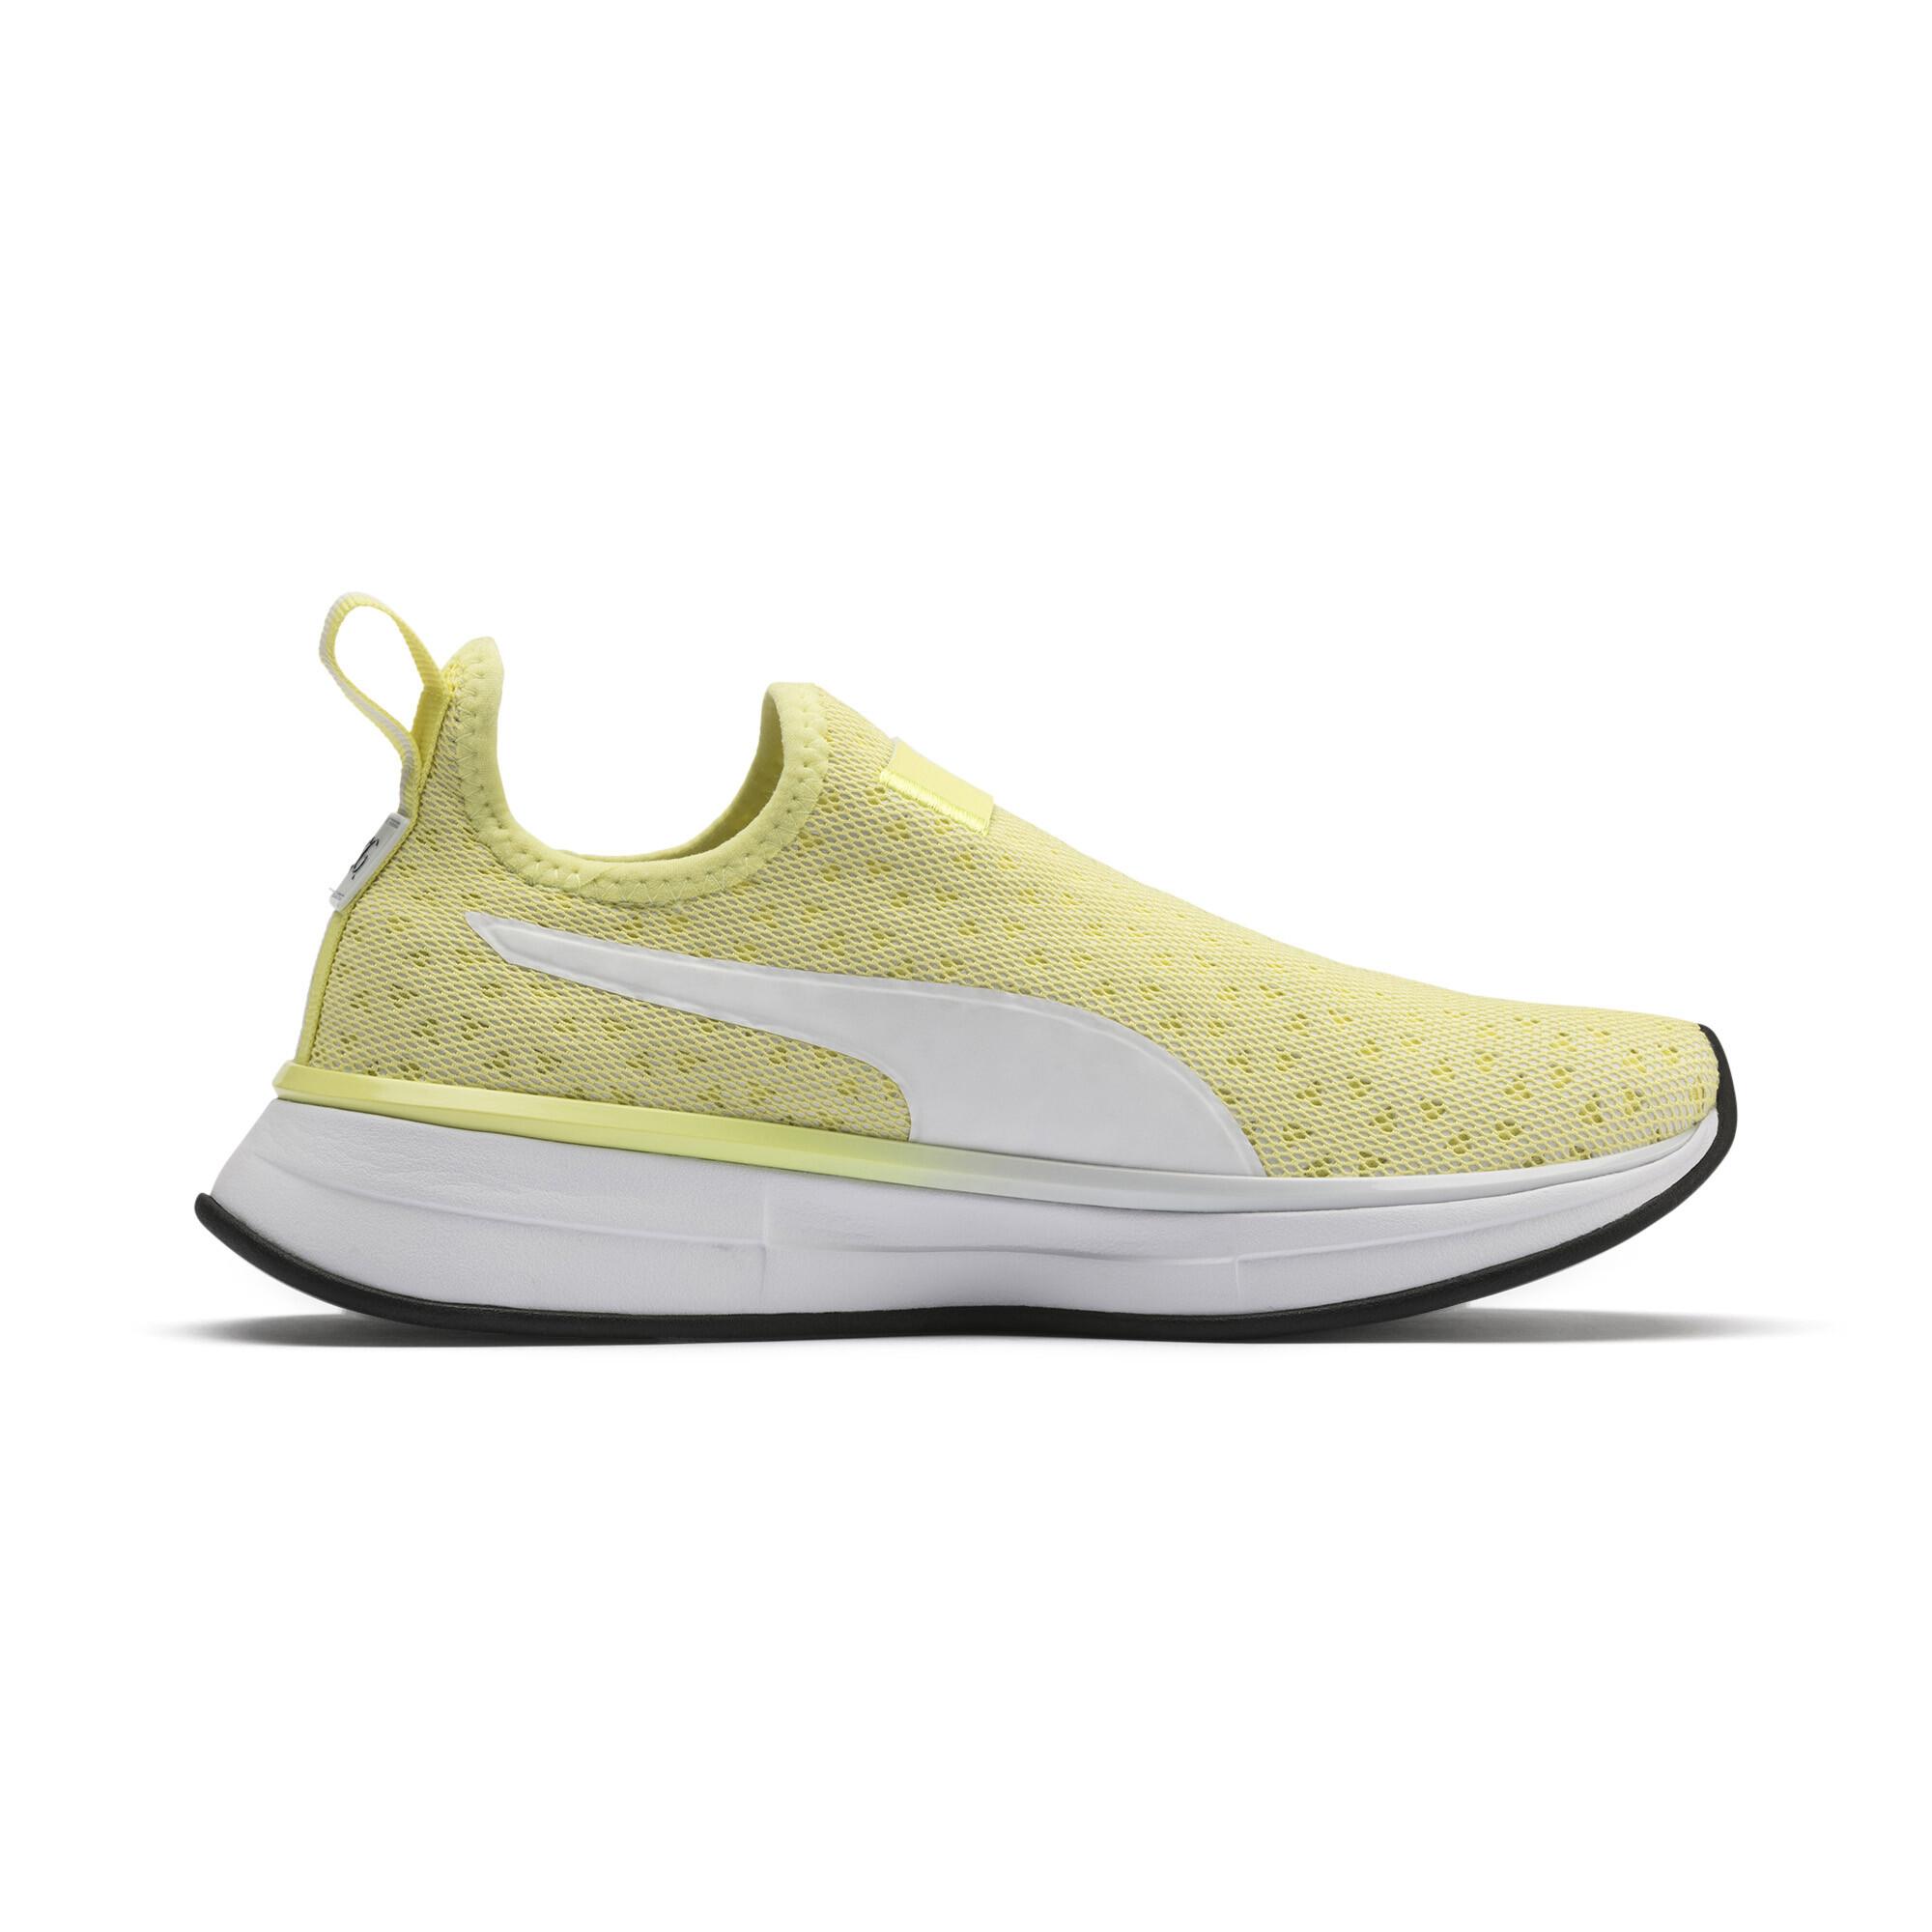 Image Puma PUMA x SELENA GOMEZ Slip-On Women's Training Shoes #6